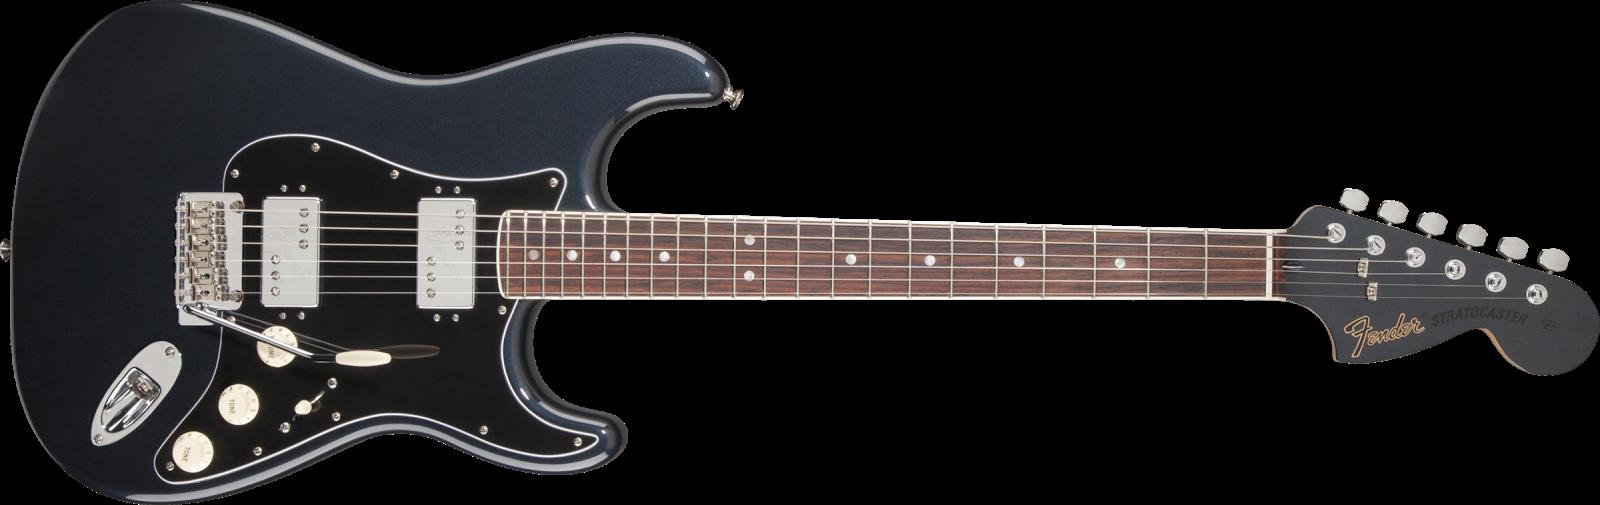 Fender Strato Fender Classic Player 50 Strat MN SHG